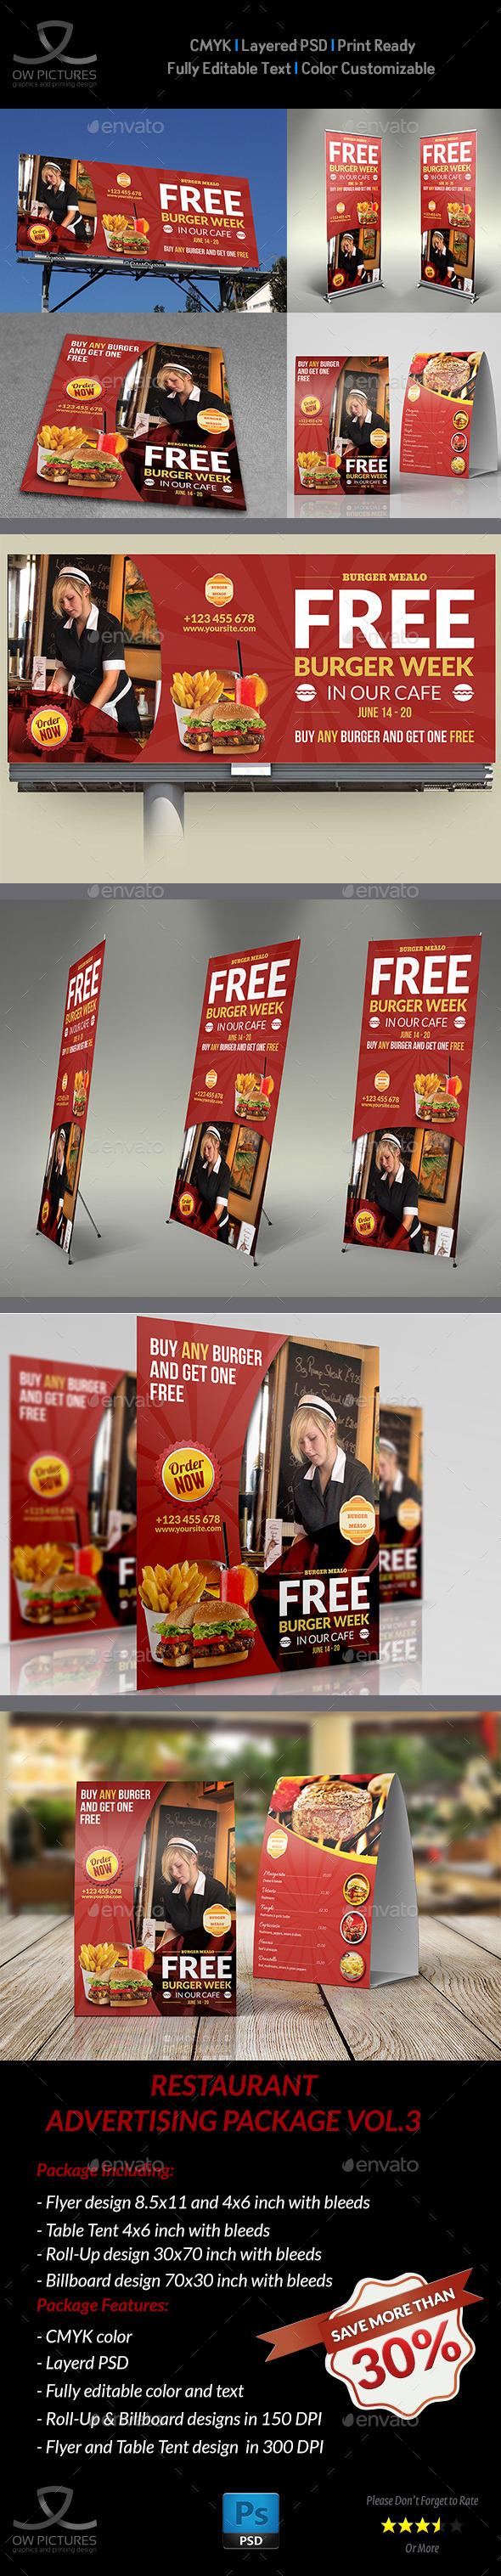 GraphicRiver Restaurant Advertising Bundle Vol.3 10671584